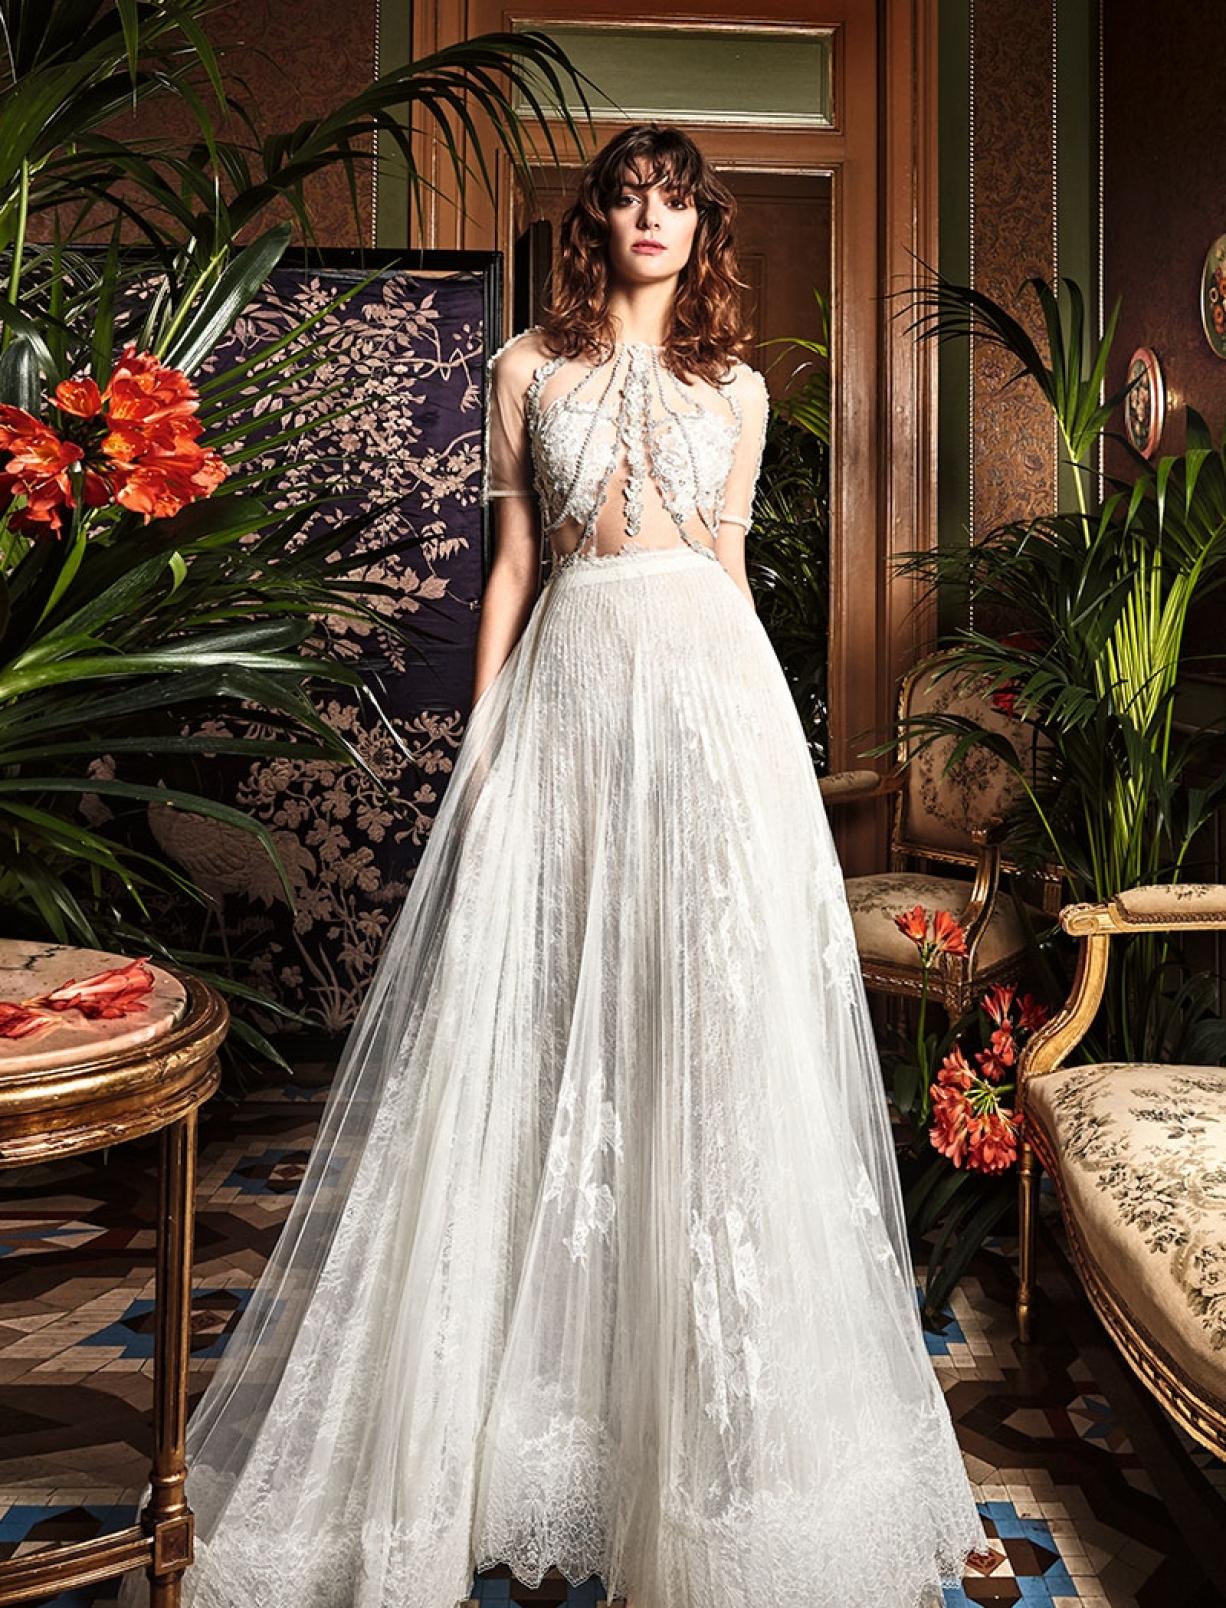 boho_chic_wedding_dresses_2017_bohemian_lace_wedding_dress_yolan_cris_chris_style_belladonal.jpg